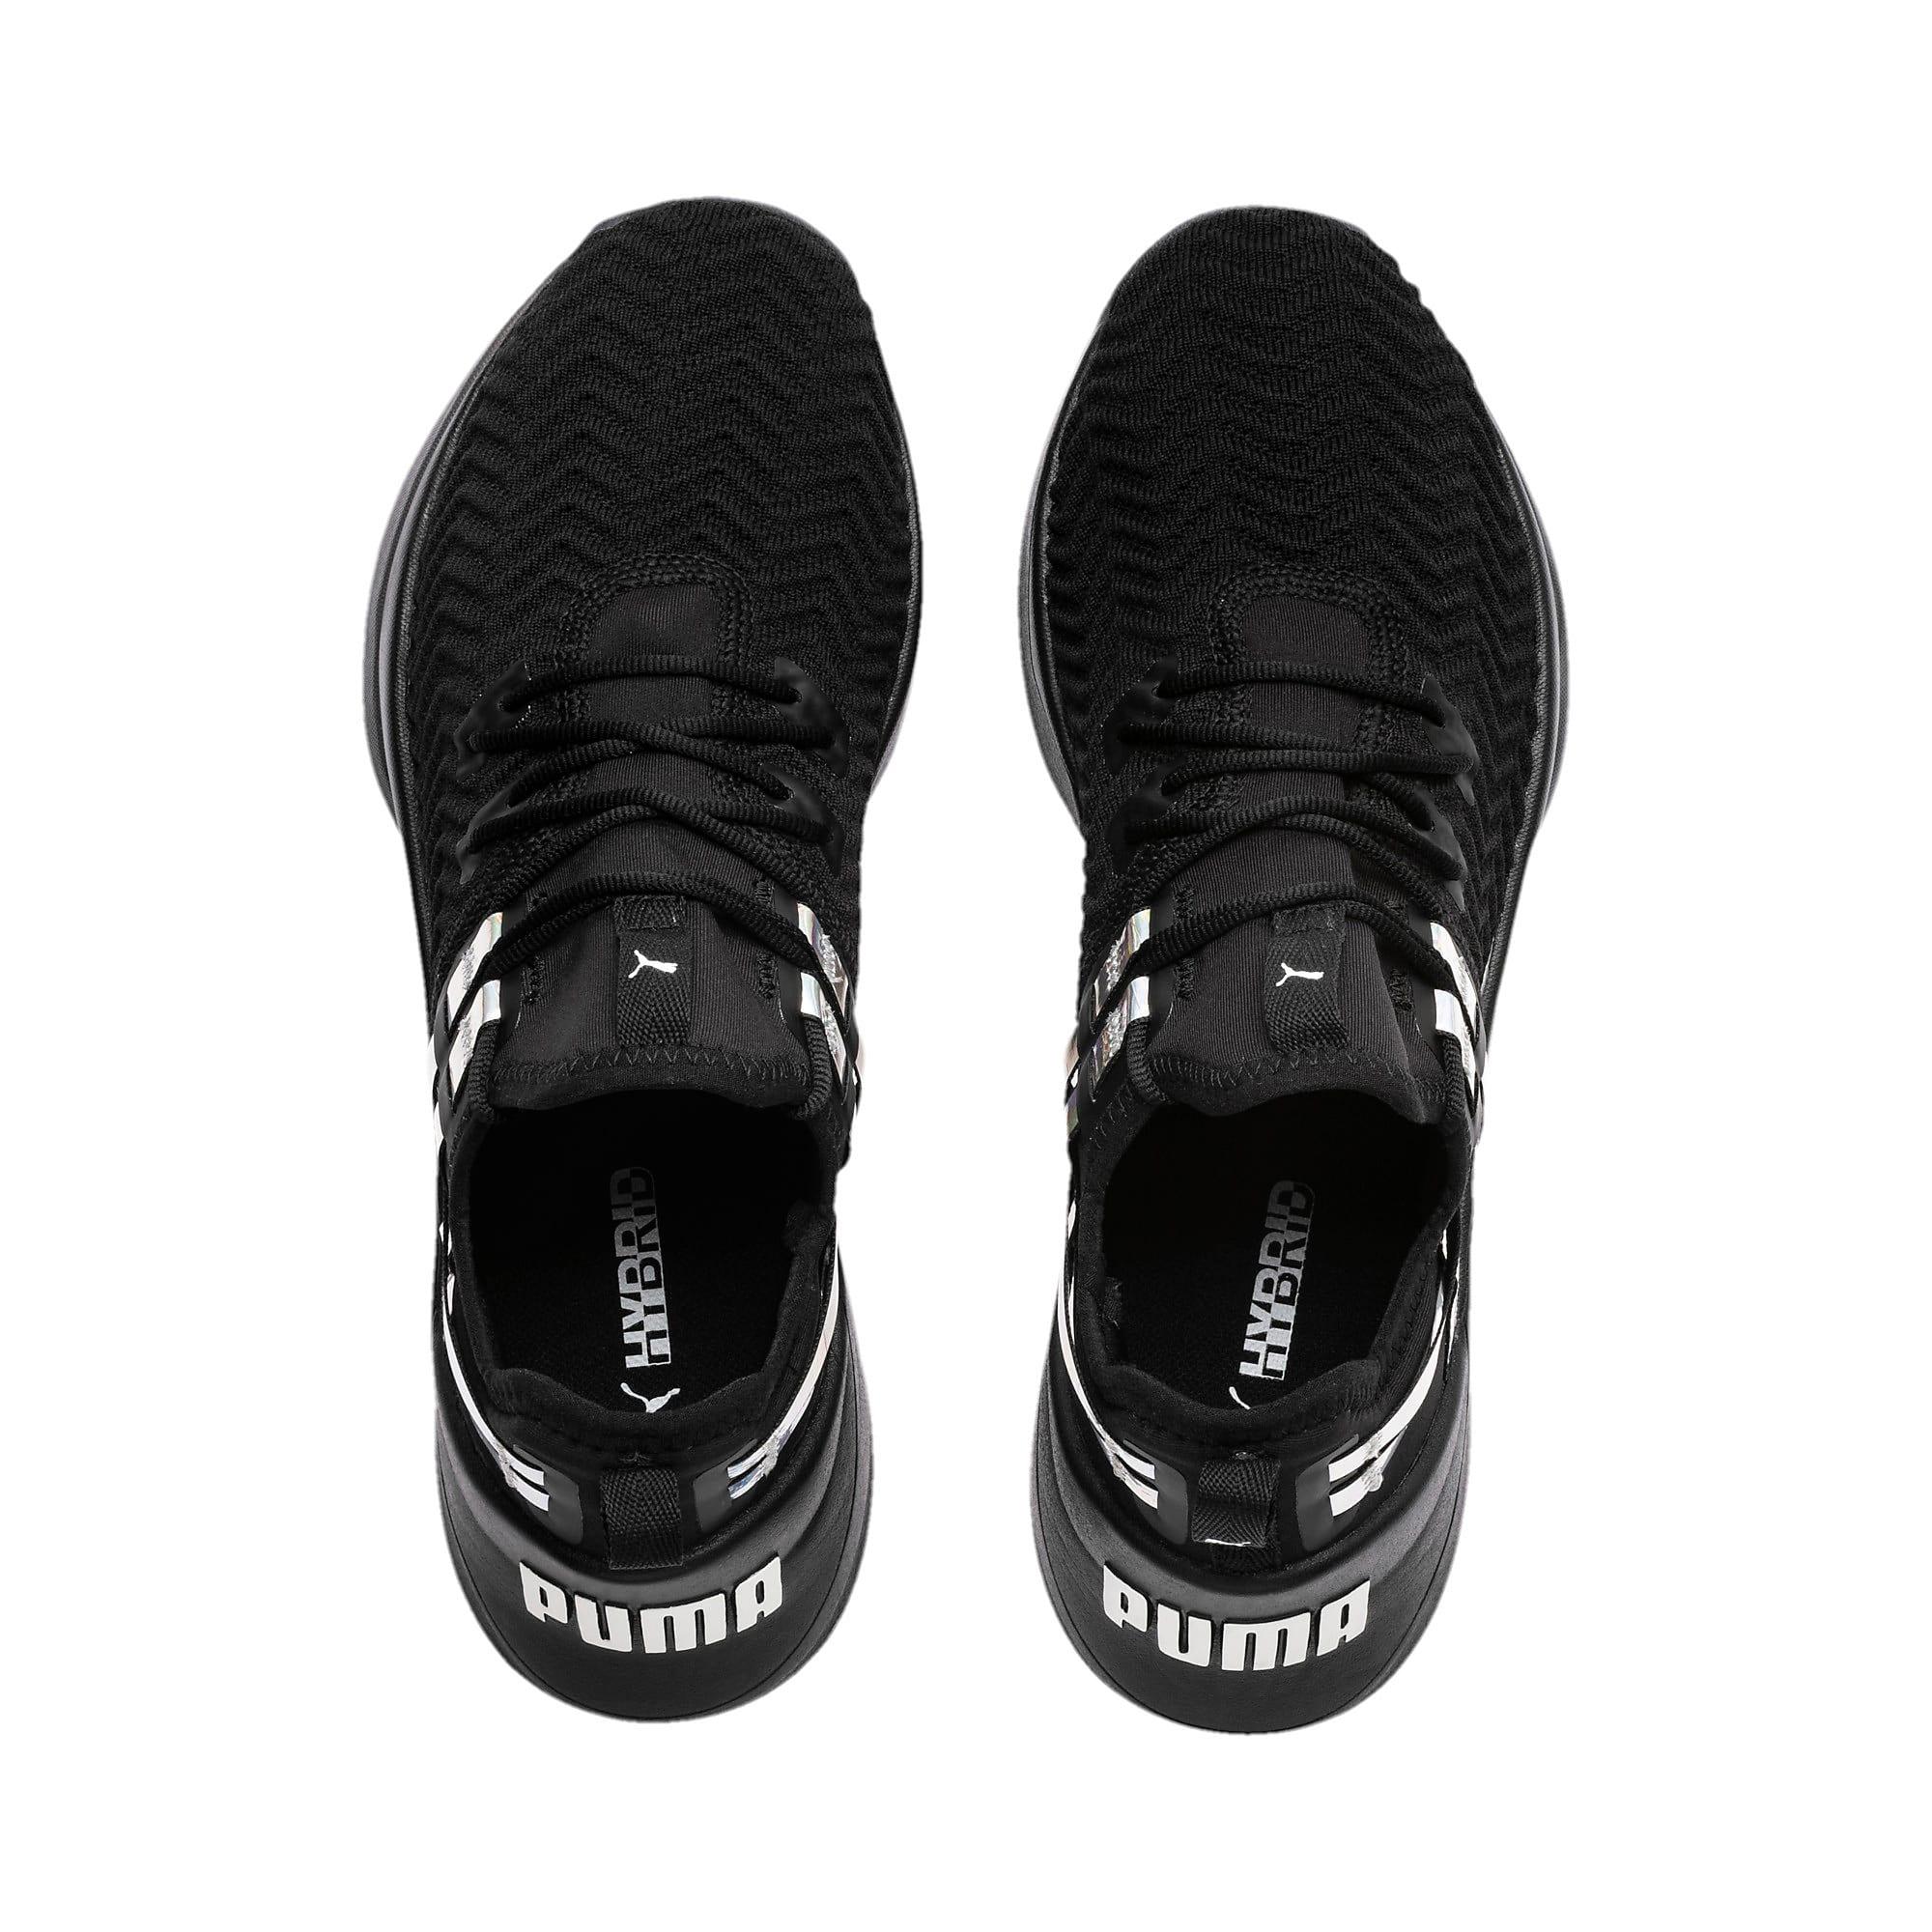 Thumbnail 7 of JAAB XT イリディセント TZ ウィメンズ, Puma Black-Puma Black, medium-JPN